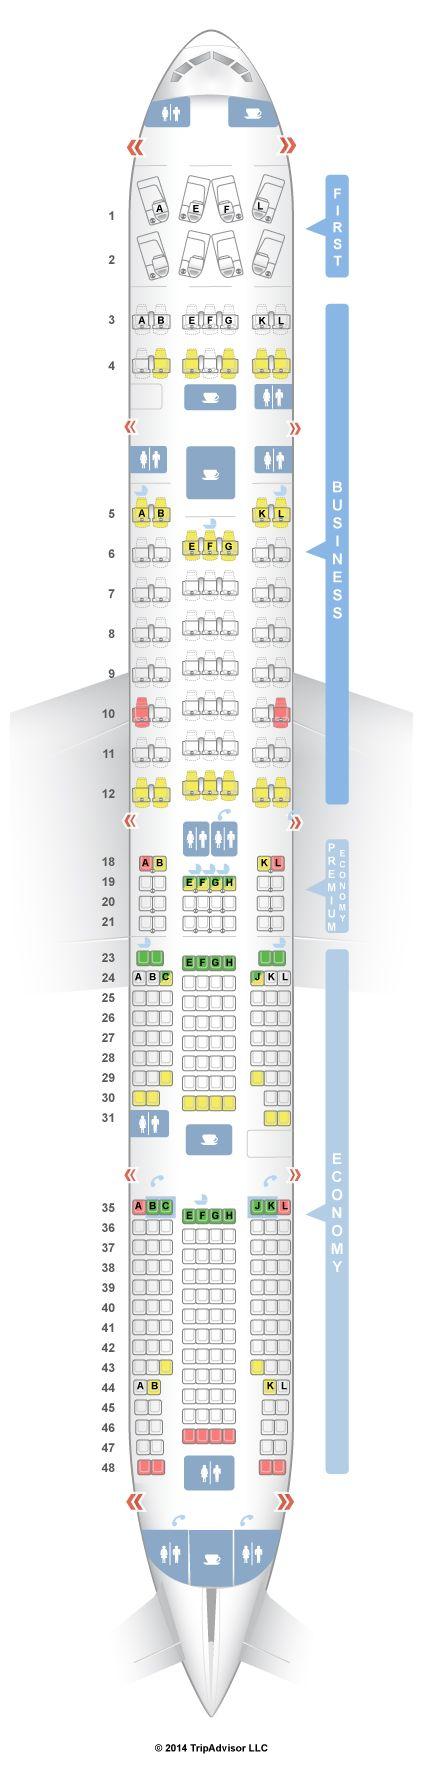 SeatGuru Seat Map Air France Boeing 777-300ER (77W) Four Class